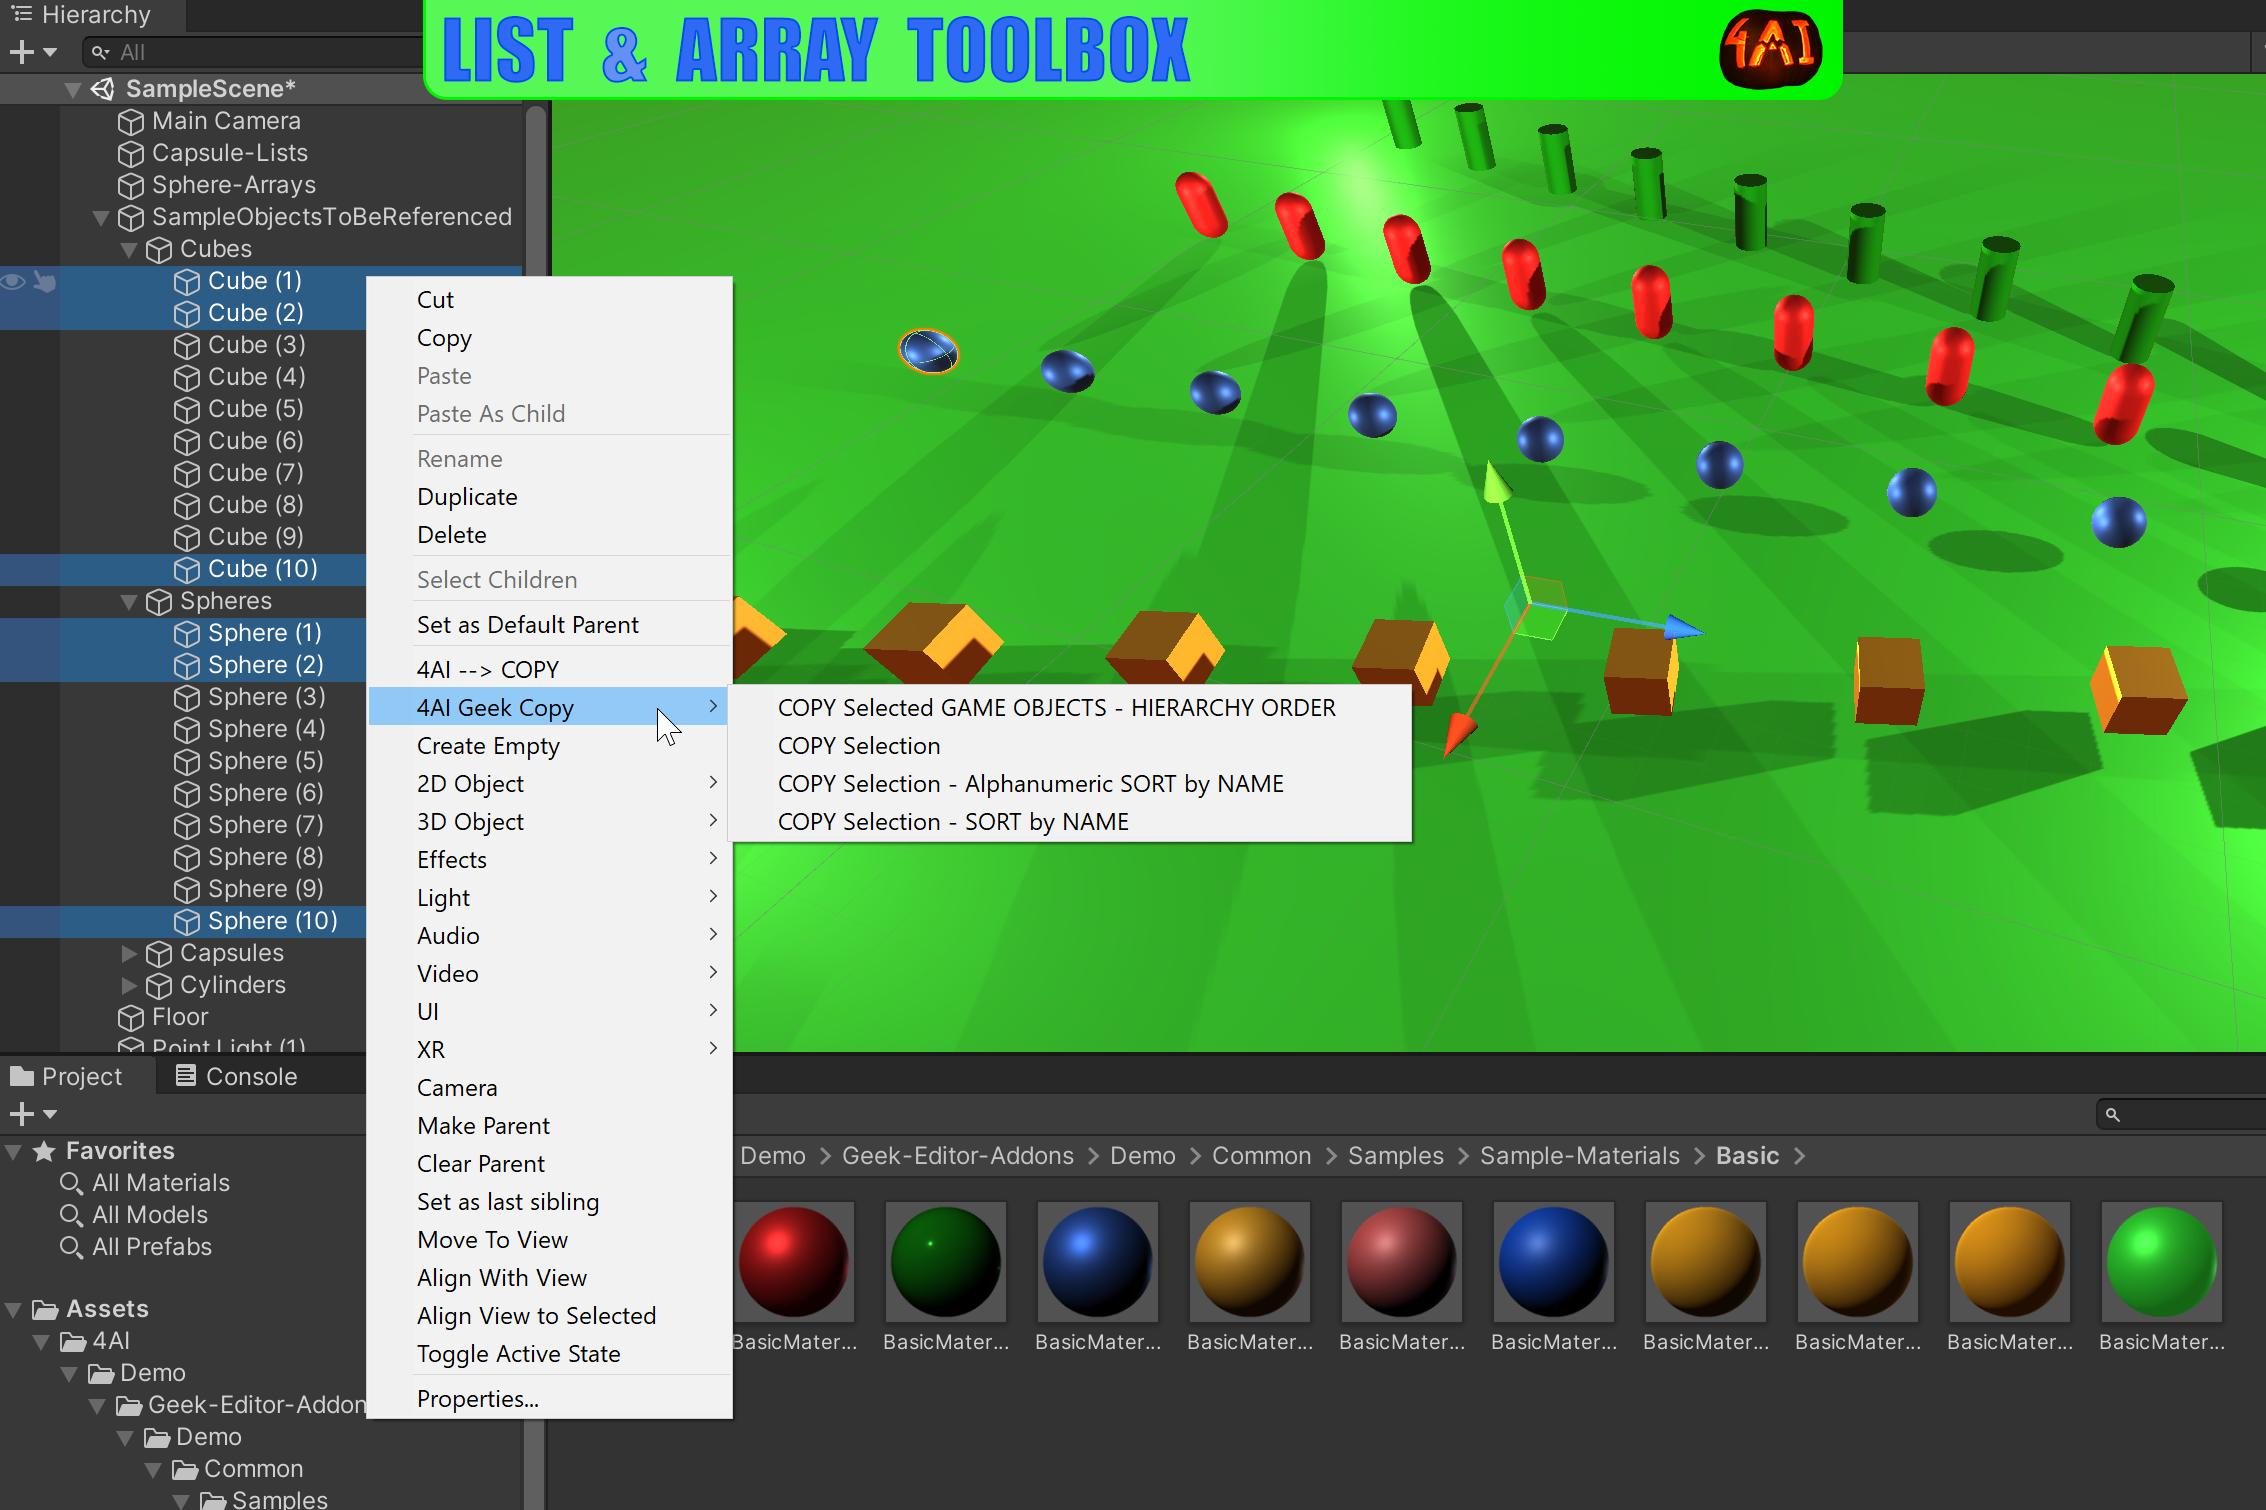 list-array-toolbox-1.png